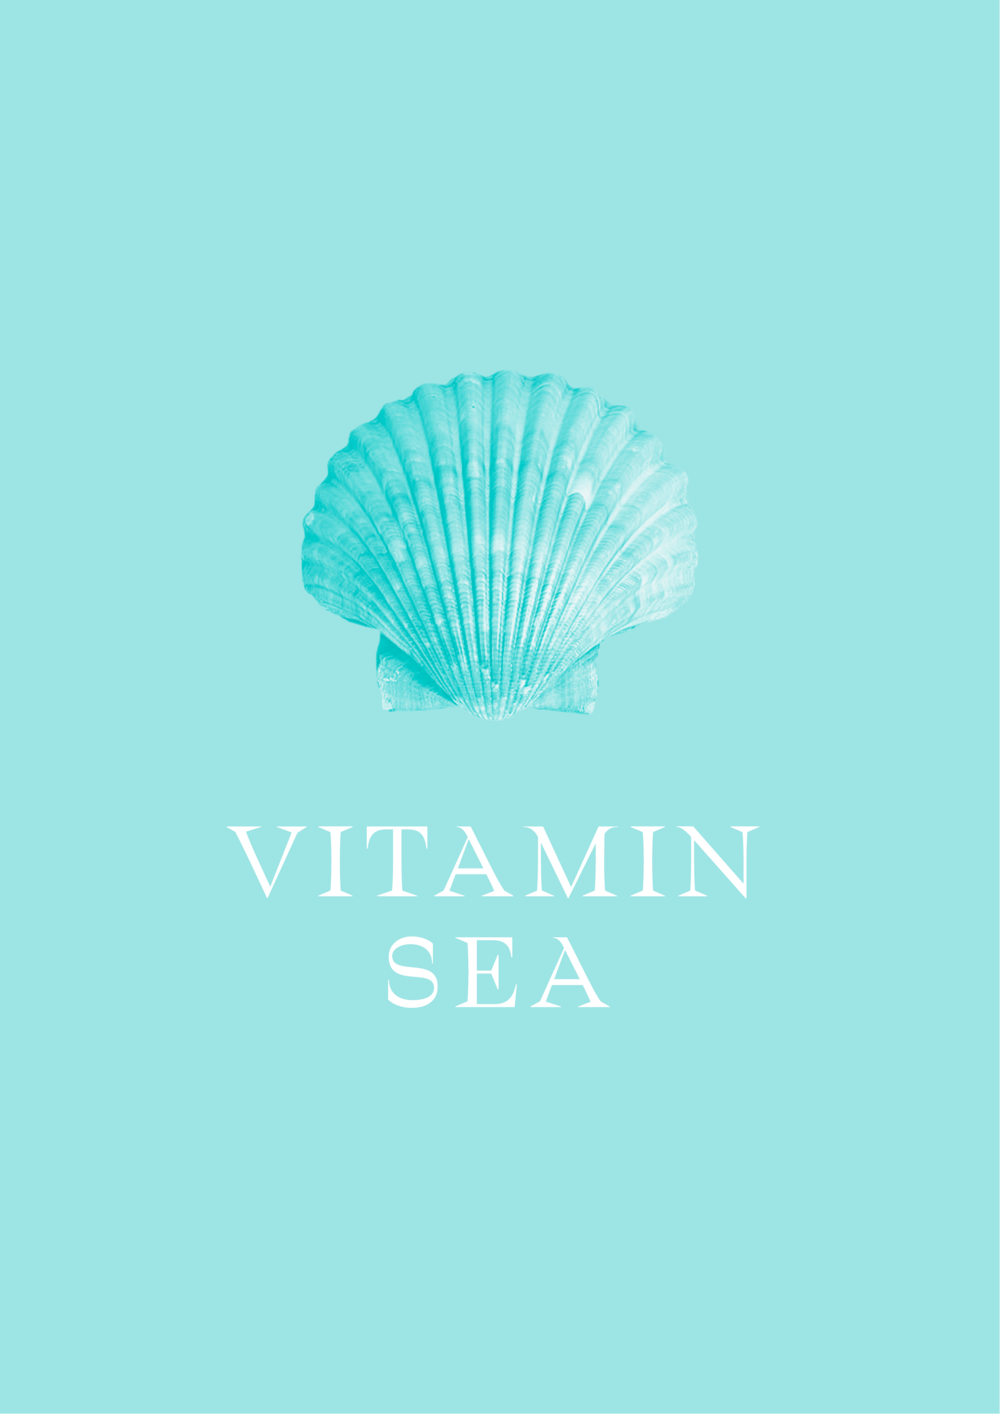 Vitamin Sea // Phylleli Design Studio and Blog